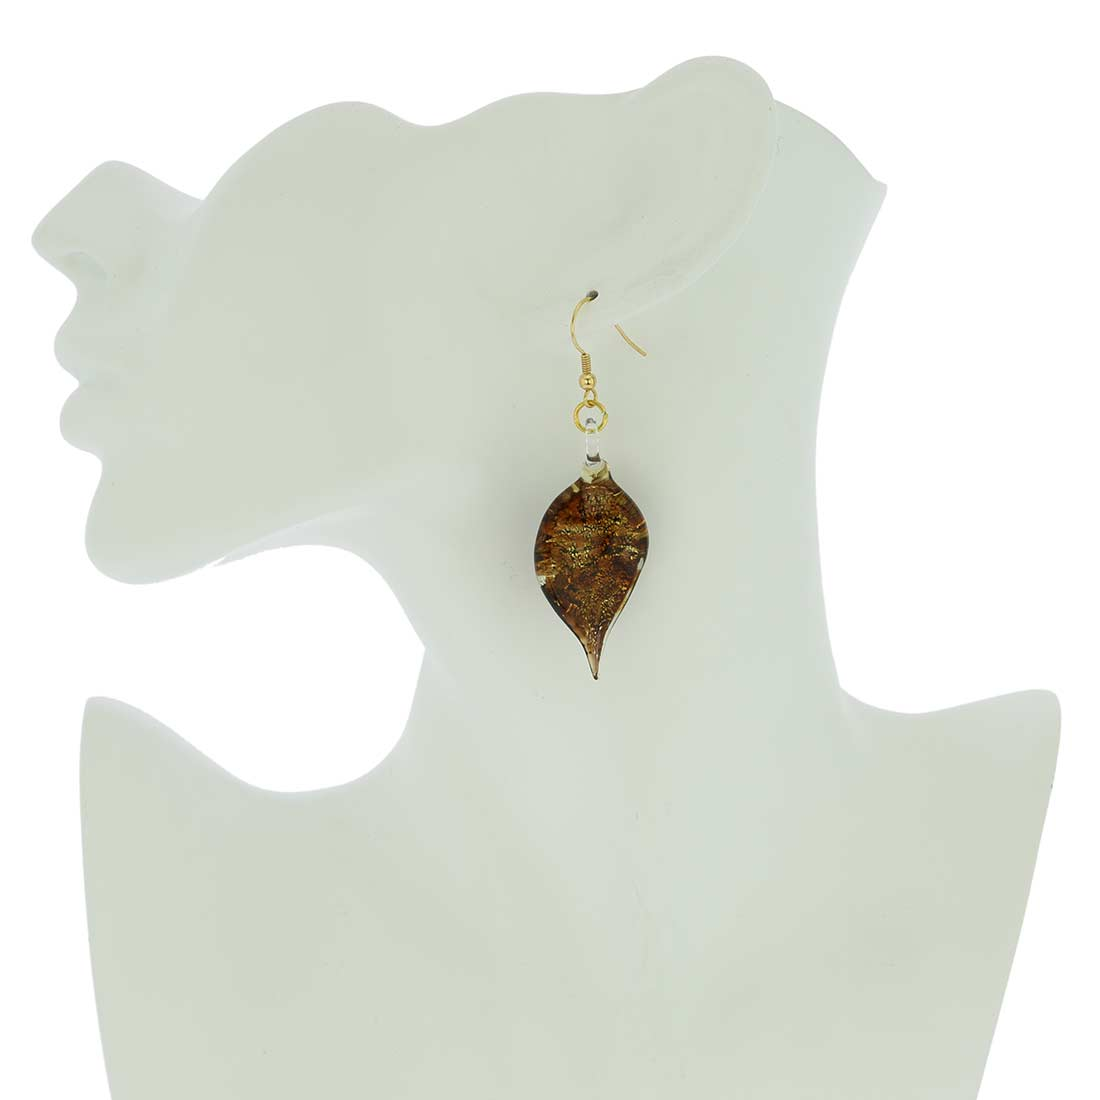 Amber Sparkle leaf-shaped earrings